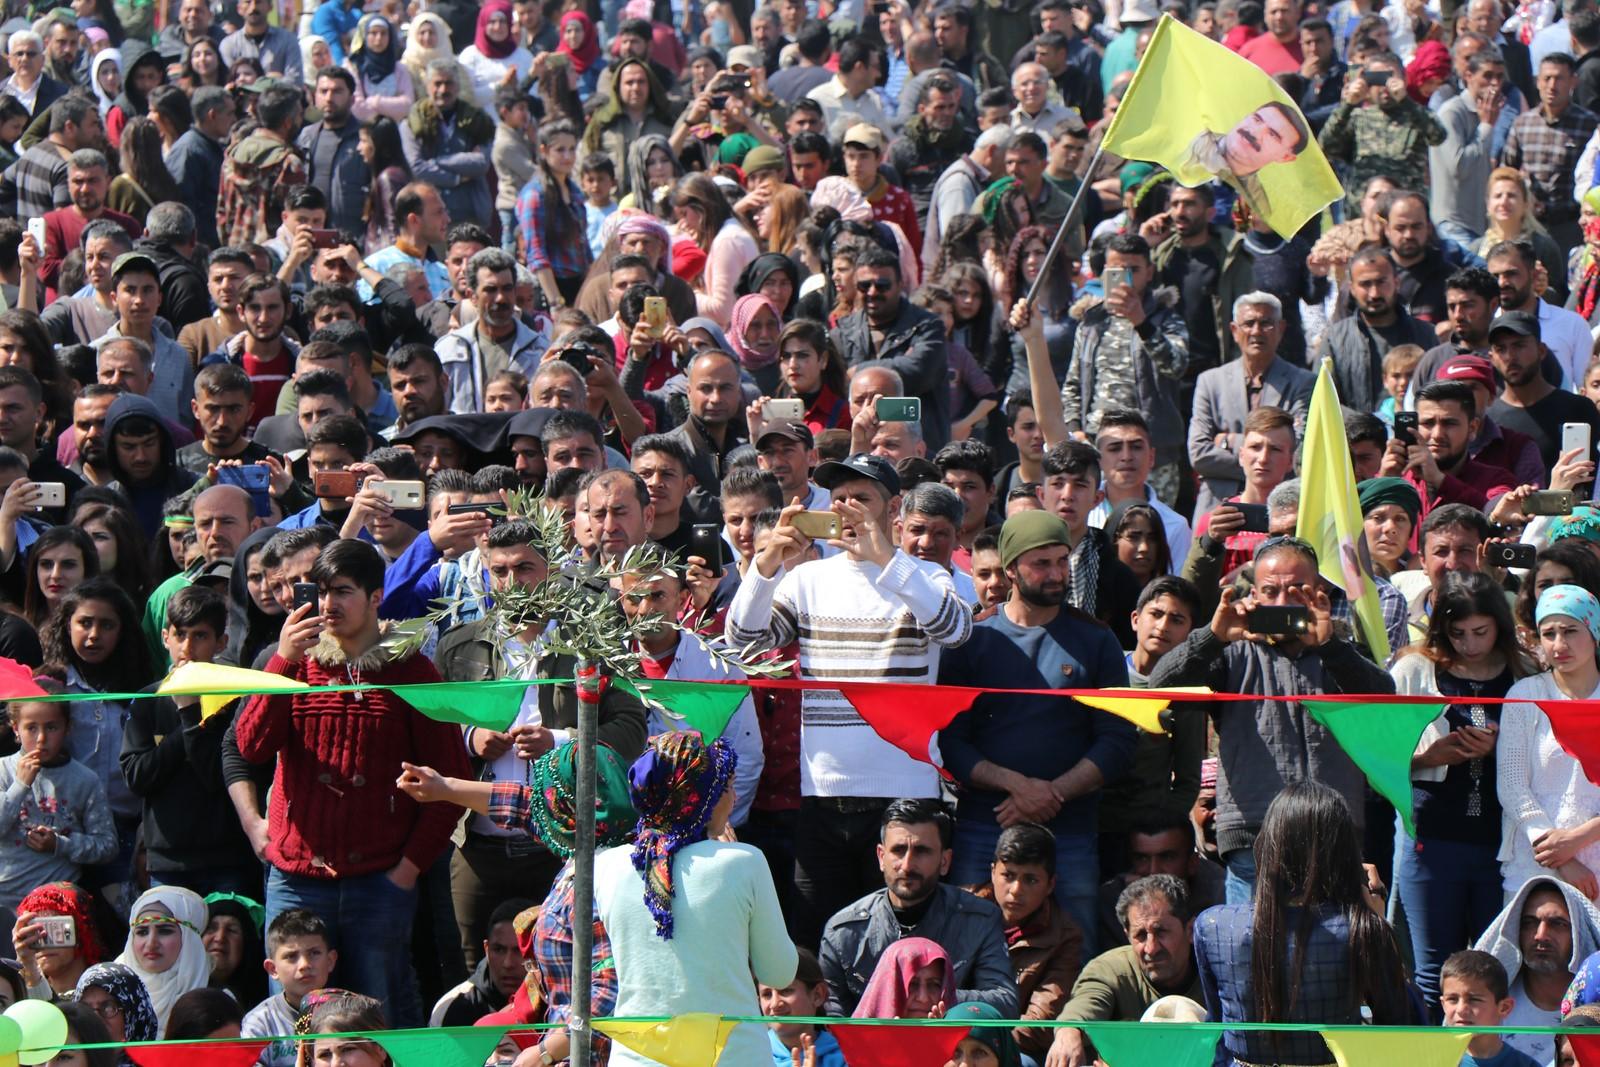 We to return to Afrin in spirit of Newroz